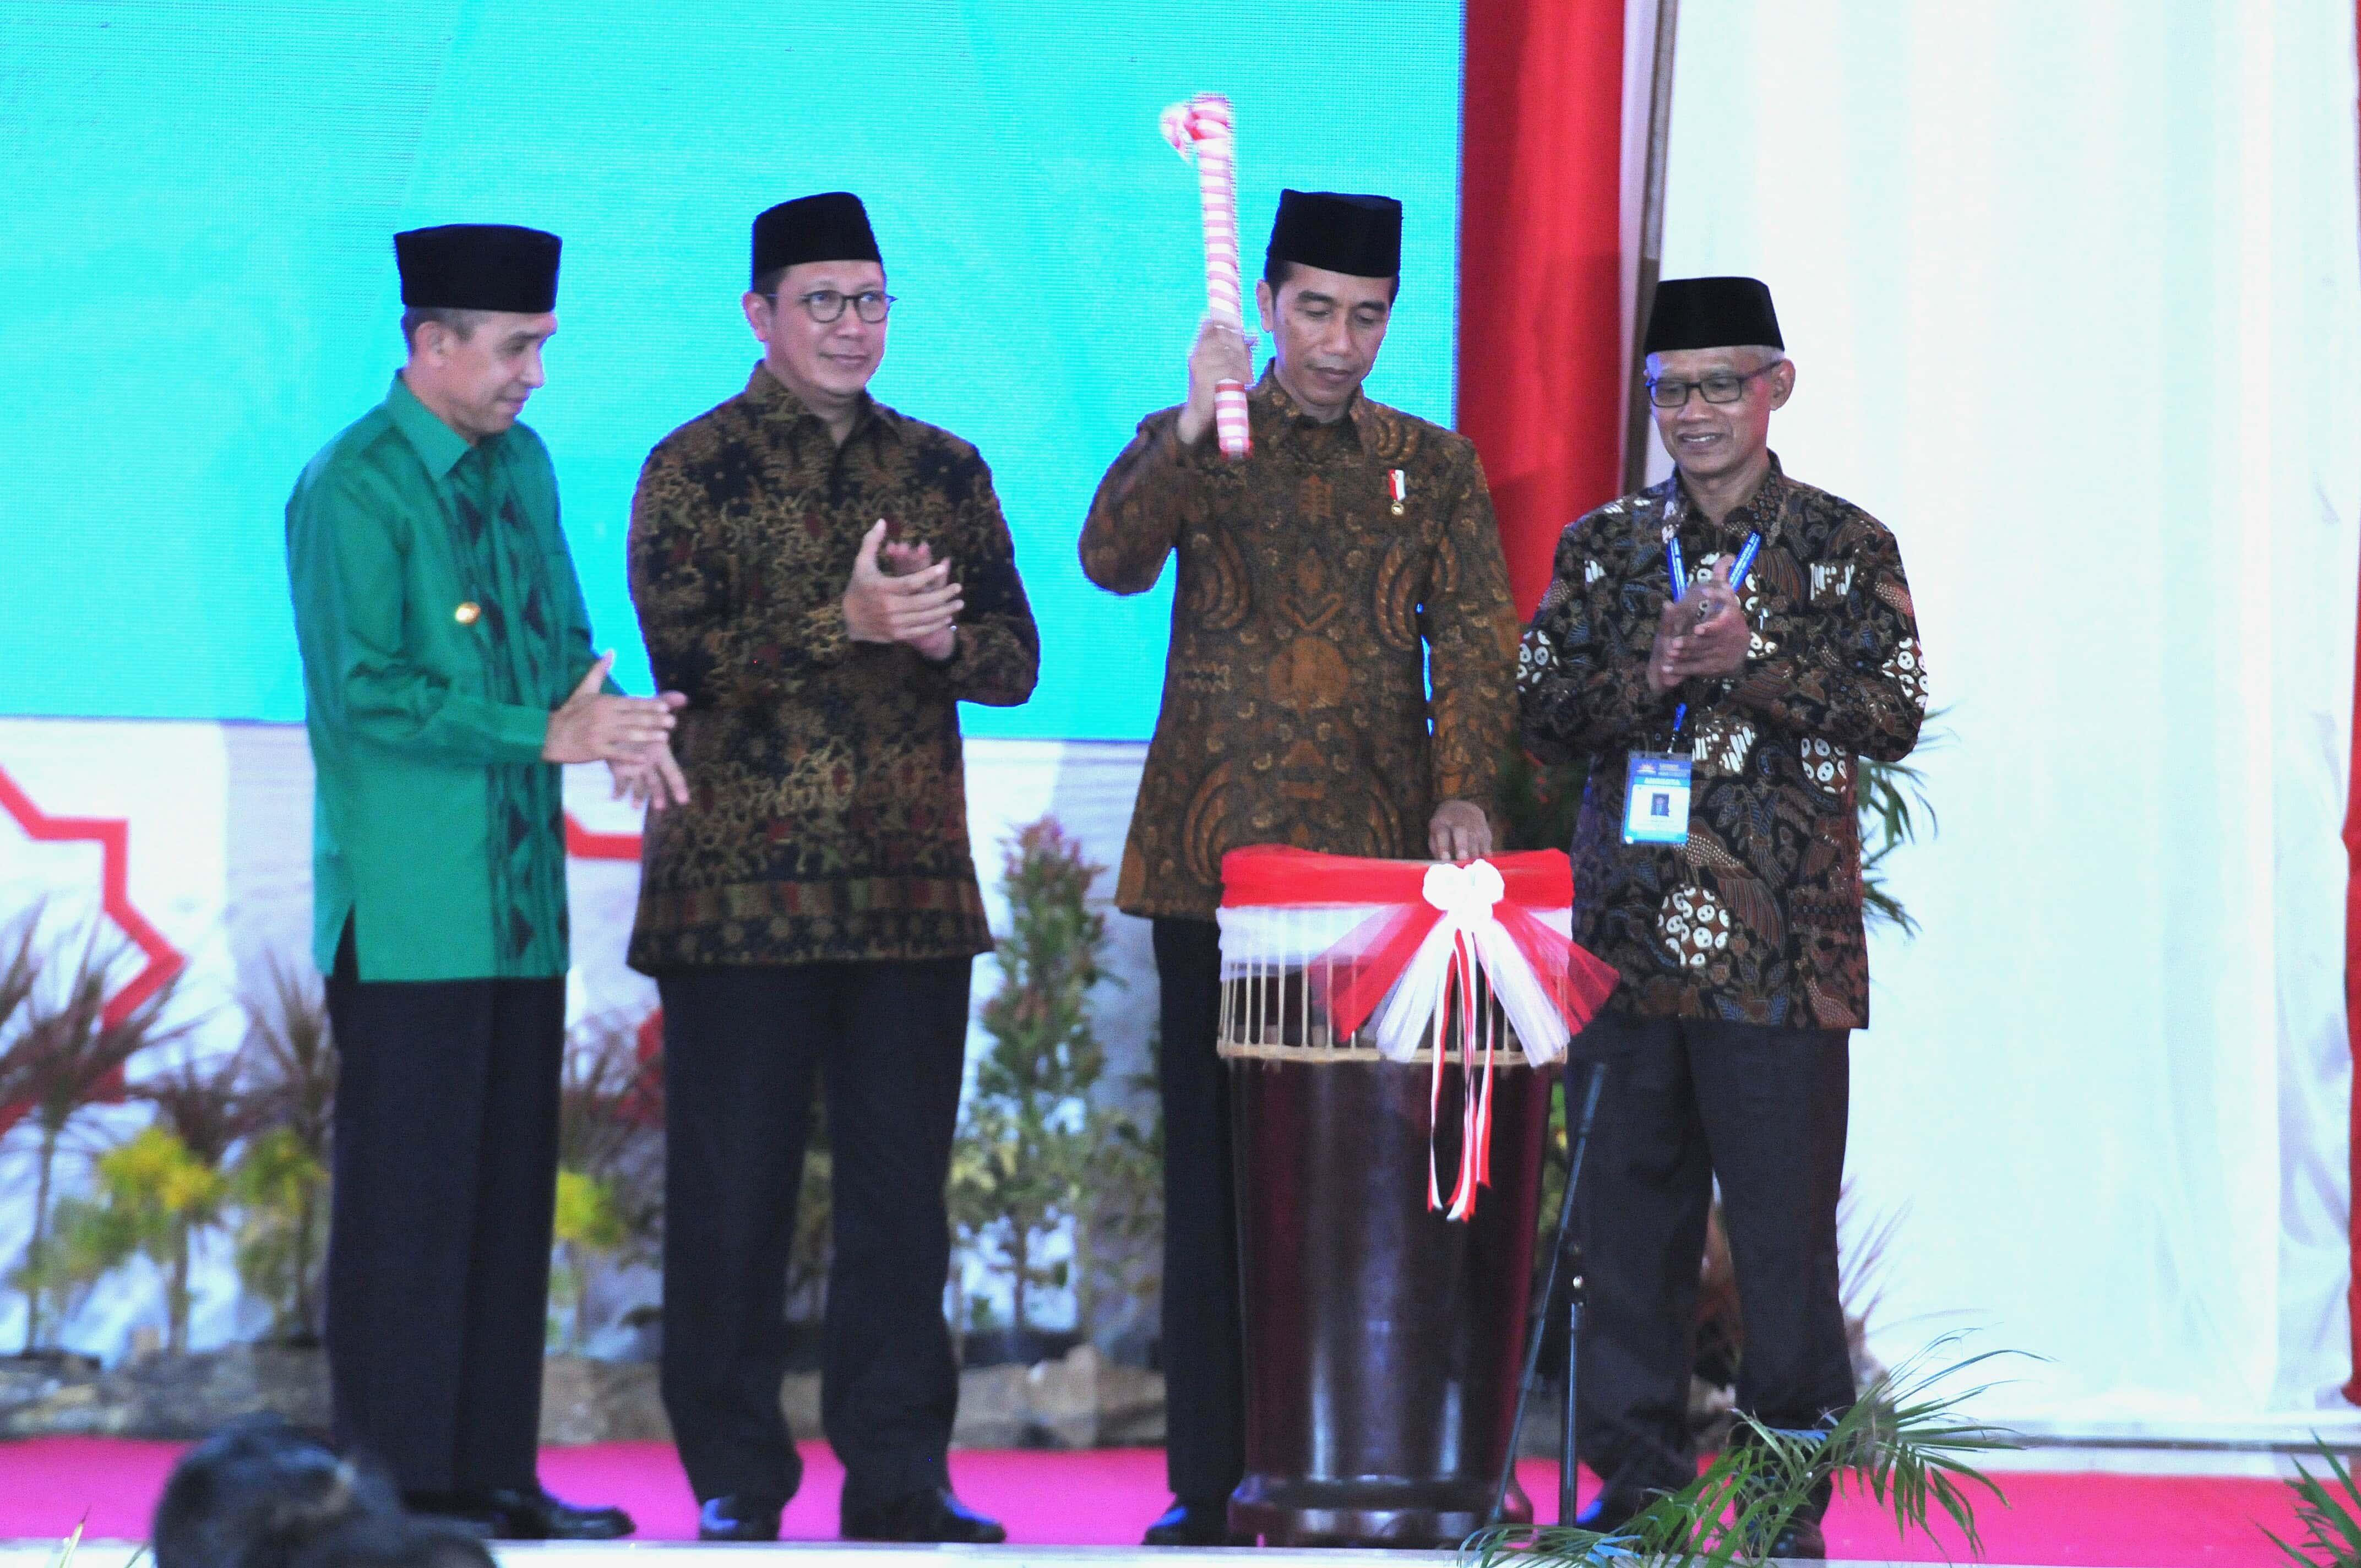 Presiden Jokowi didampingi Menag saat membuka acara Tanwir Muhammadiyah di Ambon, Maluku (24/2). (Foto: Humas/Rahmat)